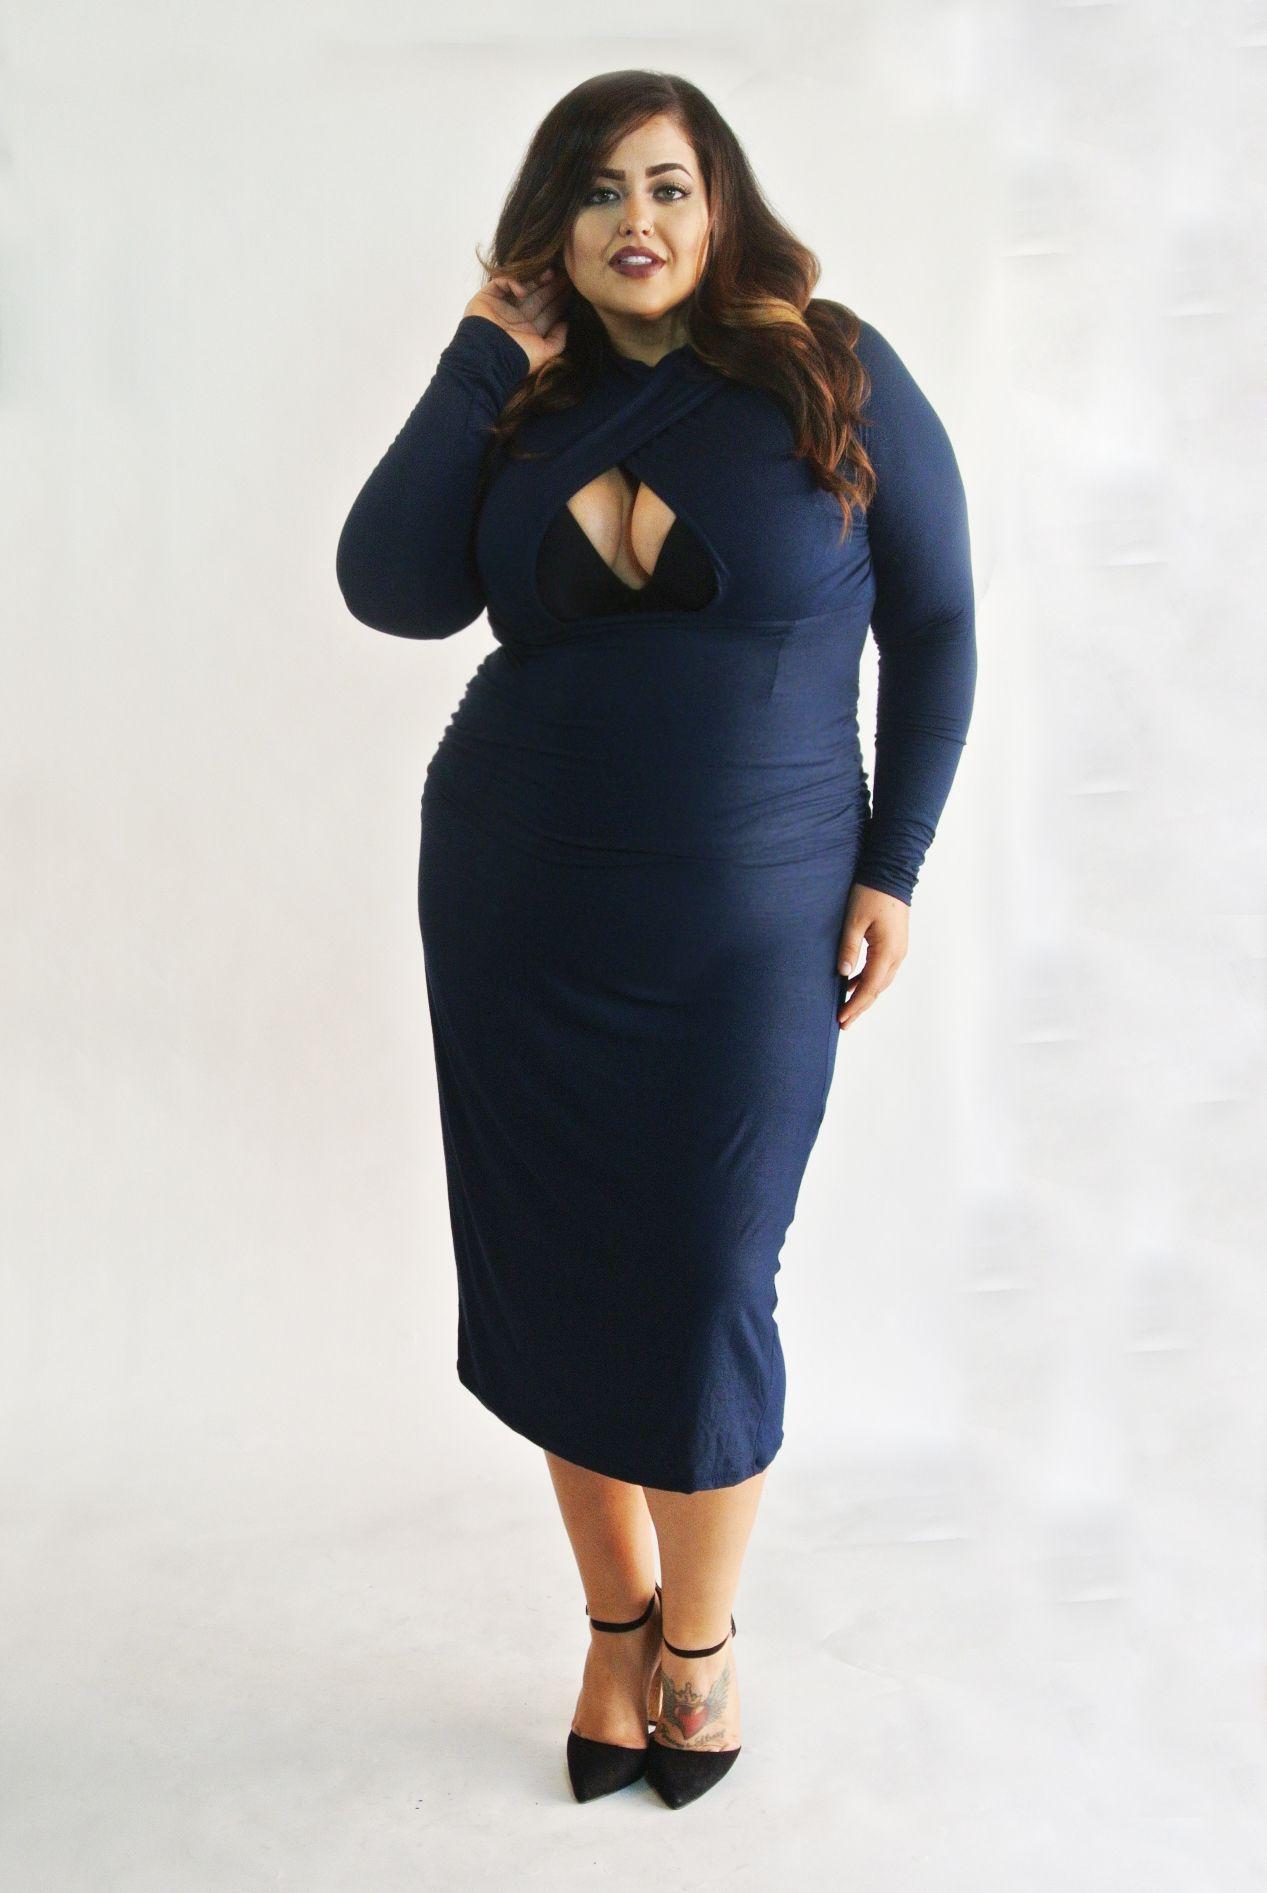 myrda j petite plus size chest cutout bodycon dress - Plus Size Valentine Dresses